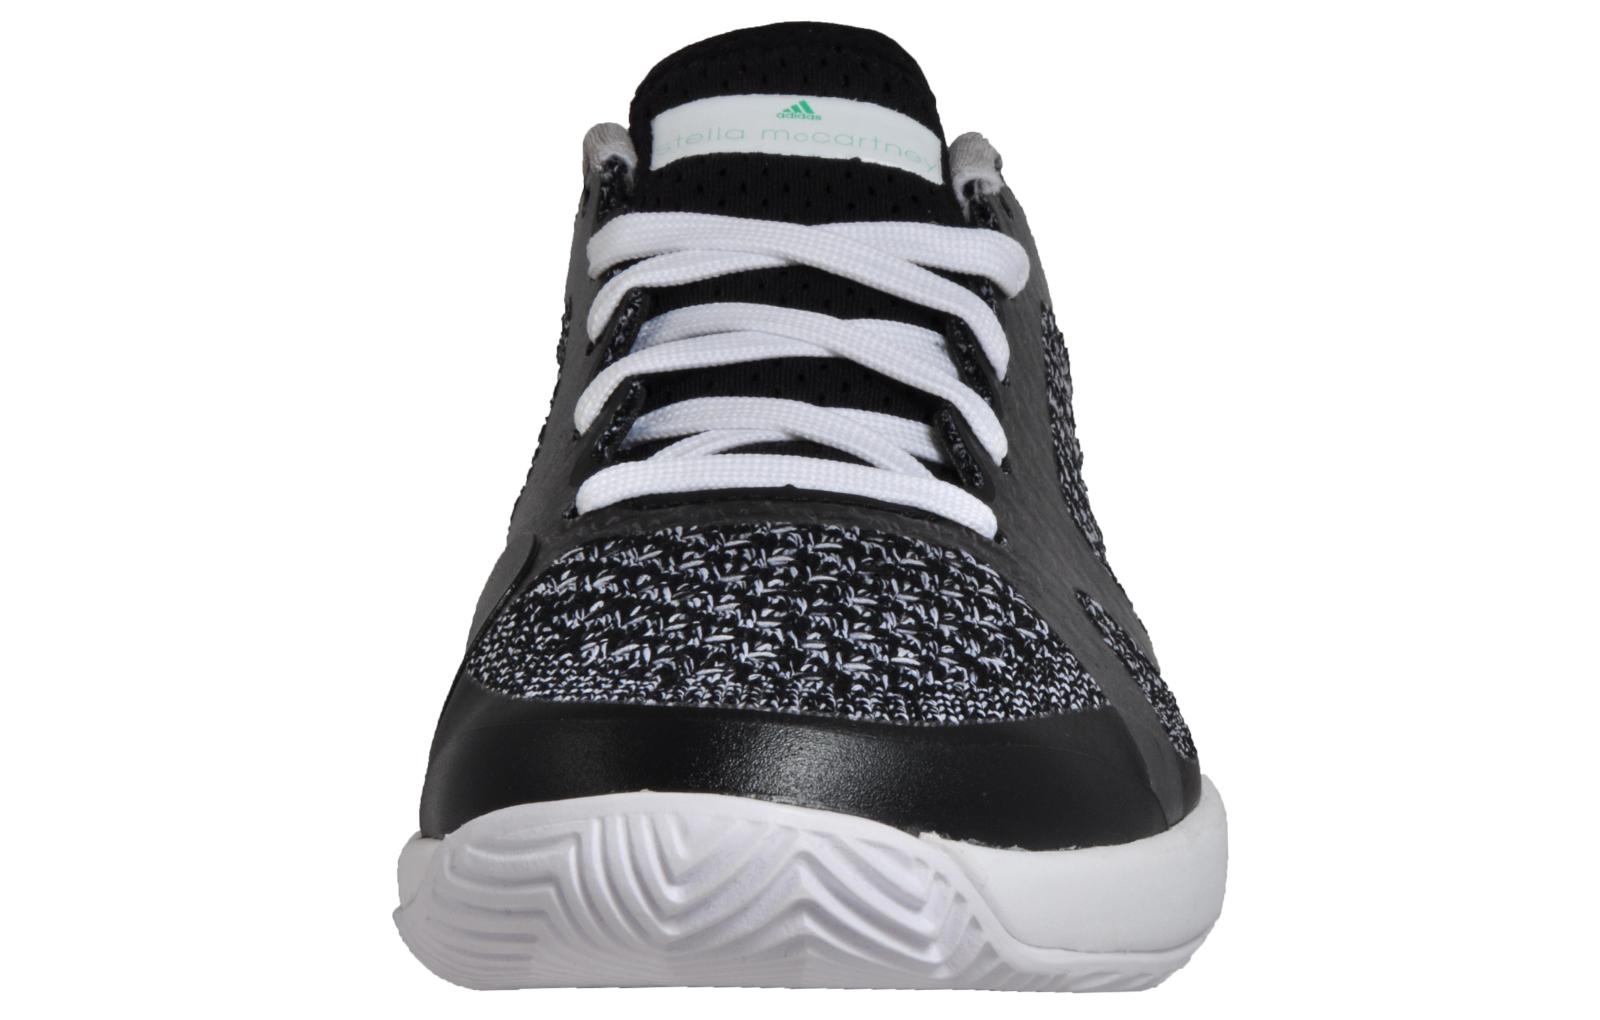 e6811eb9f71d3 Adidas ASMC Stella McCartney Barricade Boost Women s Tennis Shoes Black